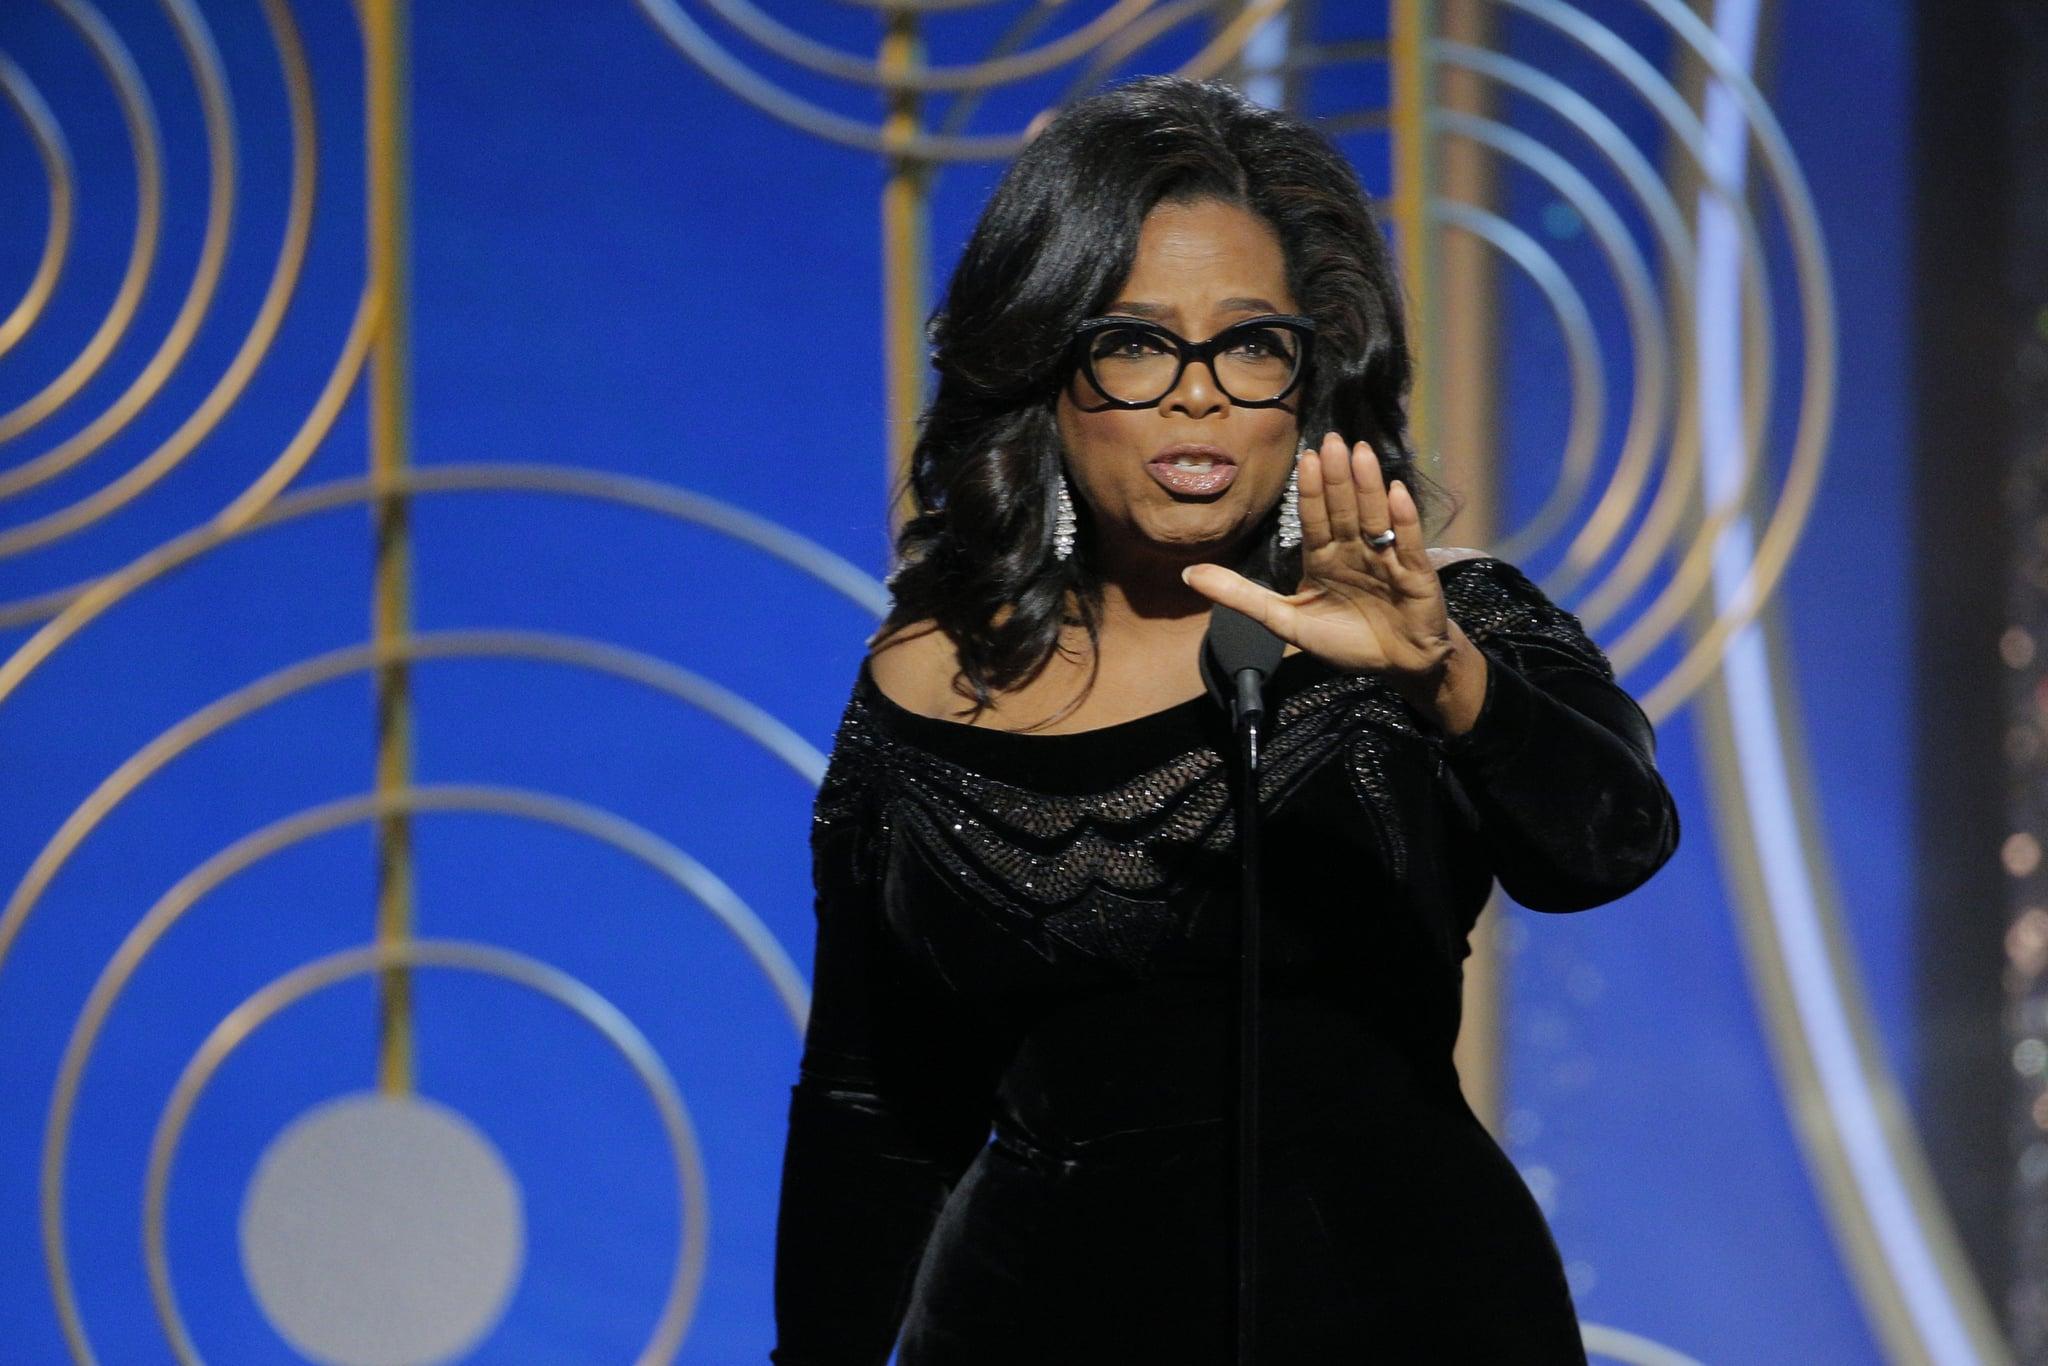 Oprah's Golden Globes speech sparks presidential run rumours, Trump reacts